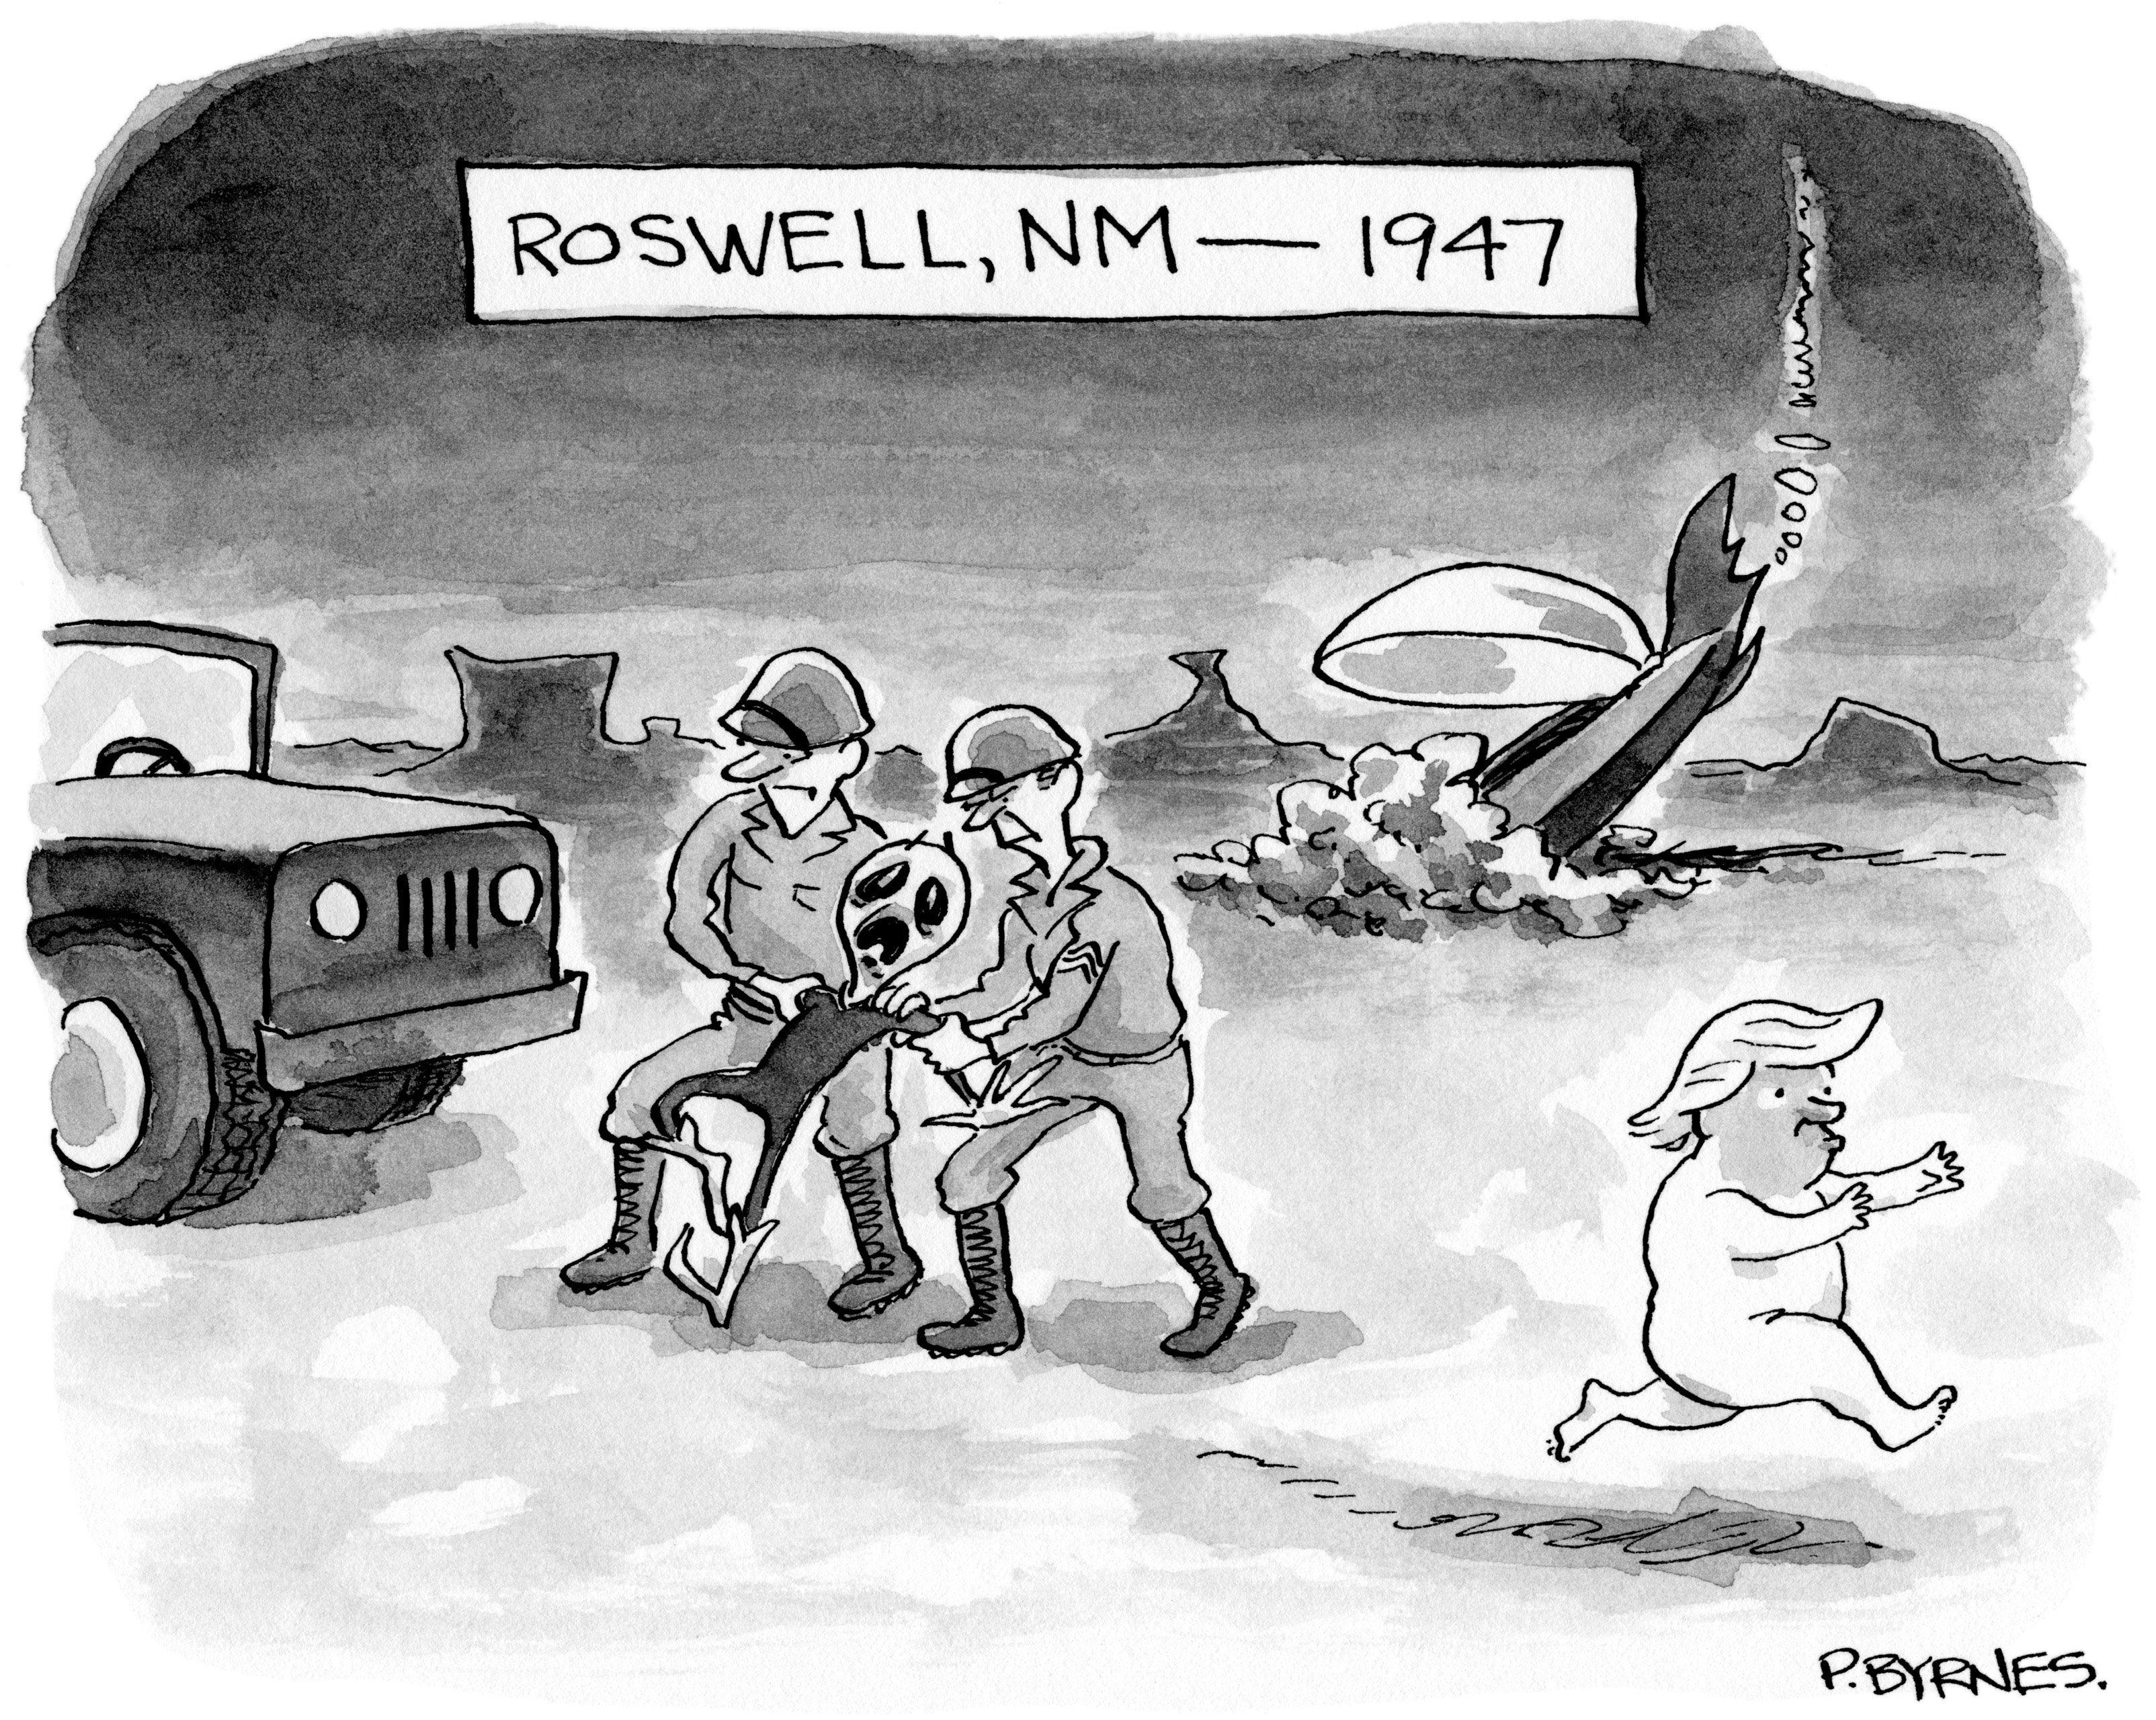 Daily Cartoon 051017 roswell trump | Truth | Pinterest | Cartoon and ...